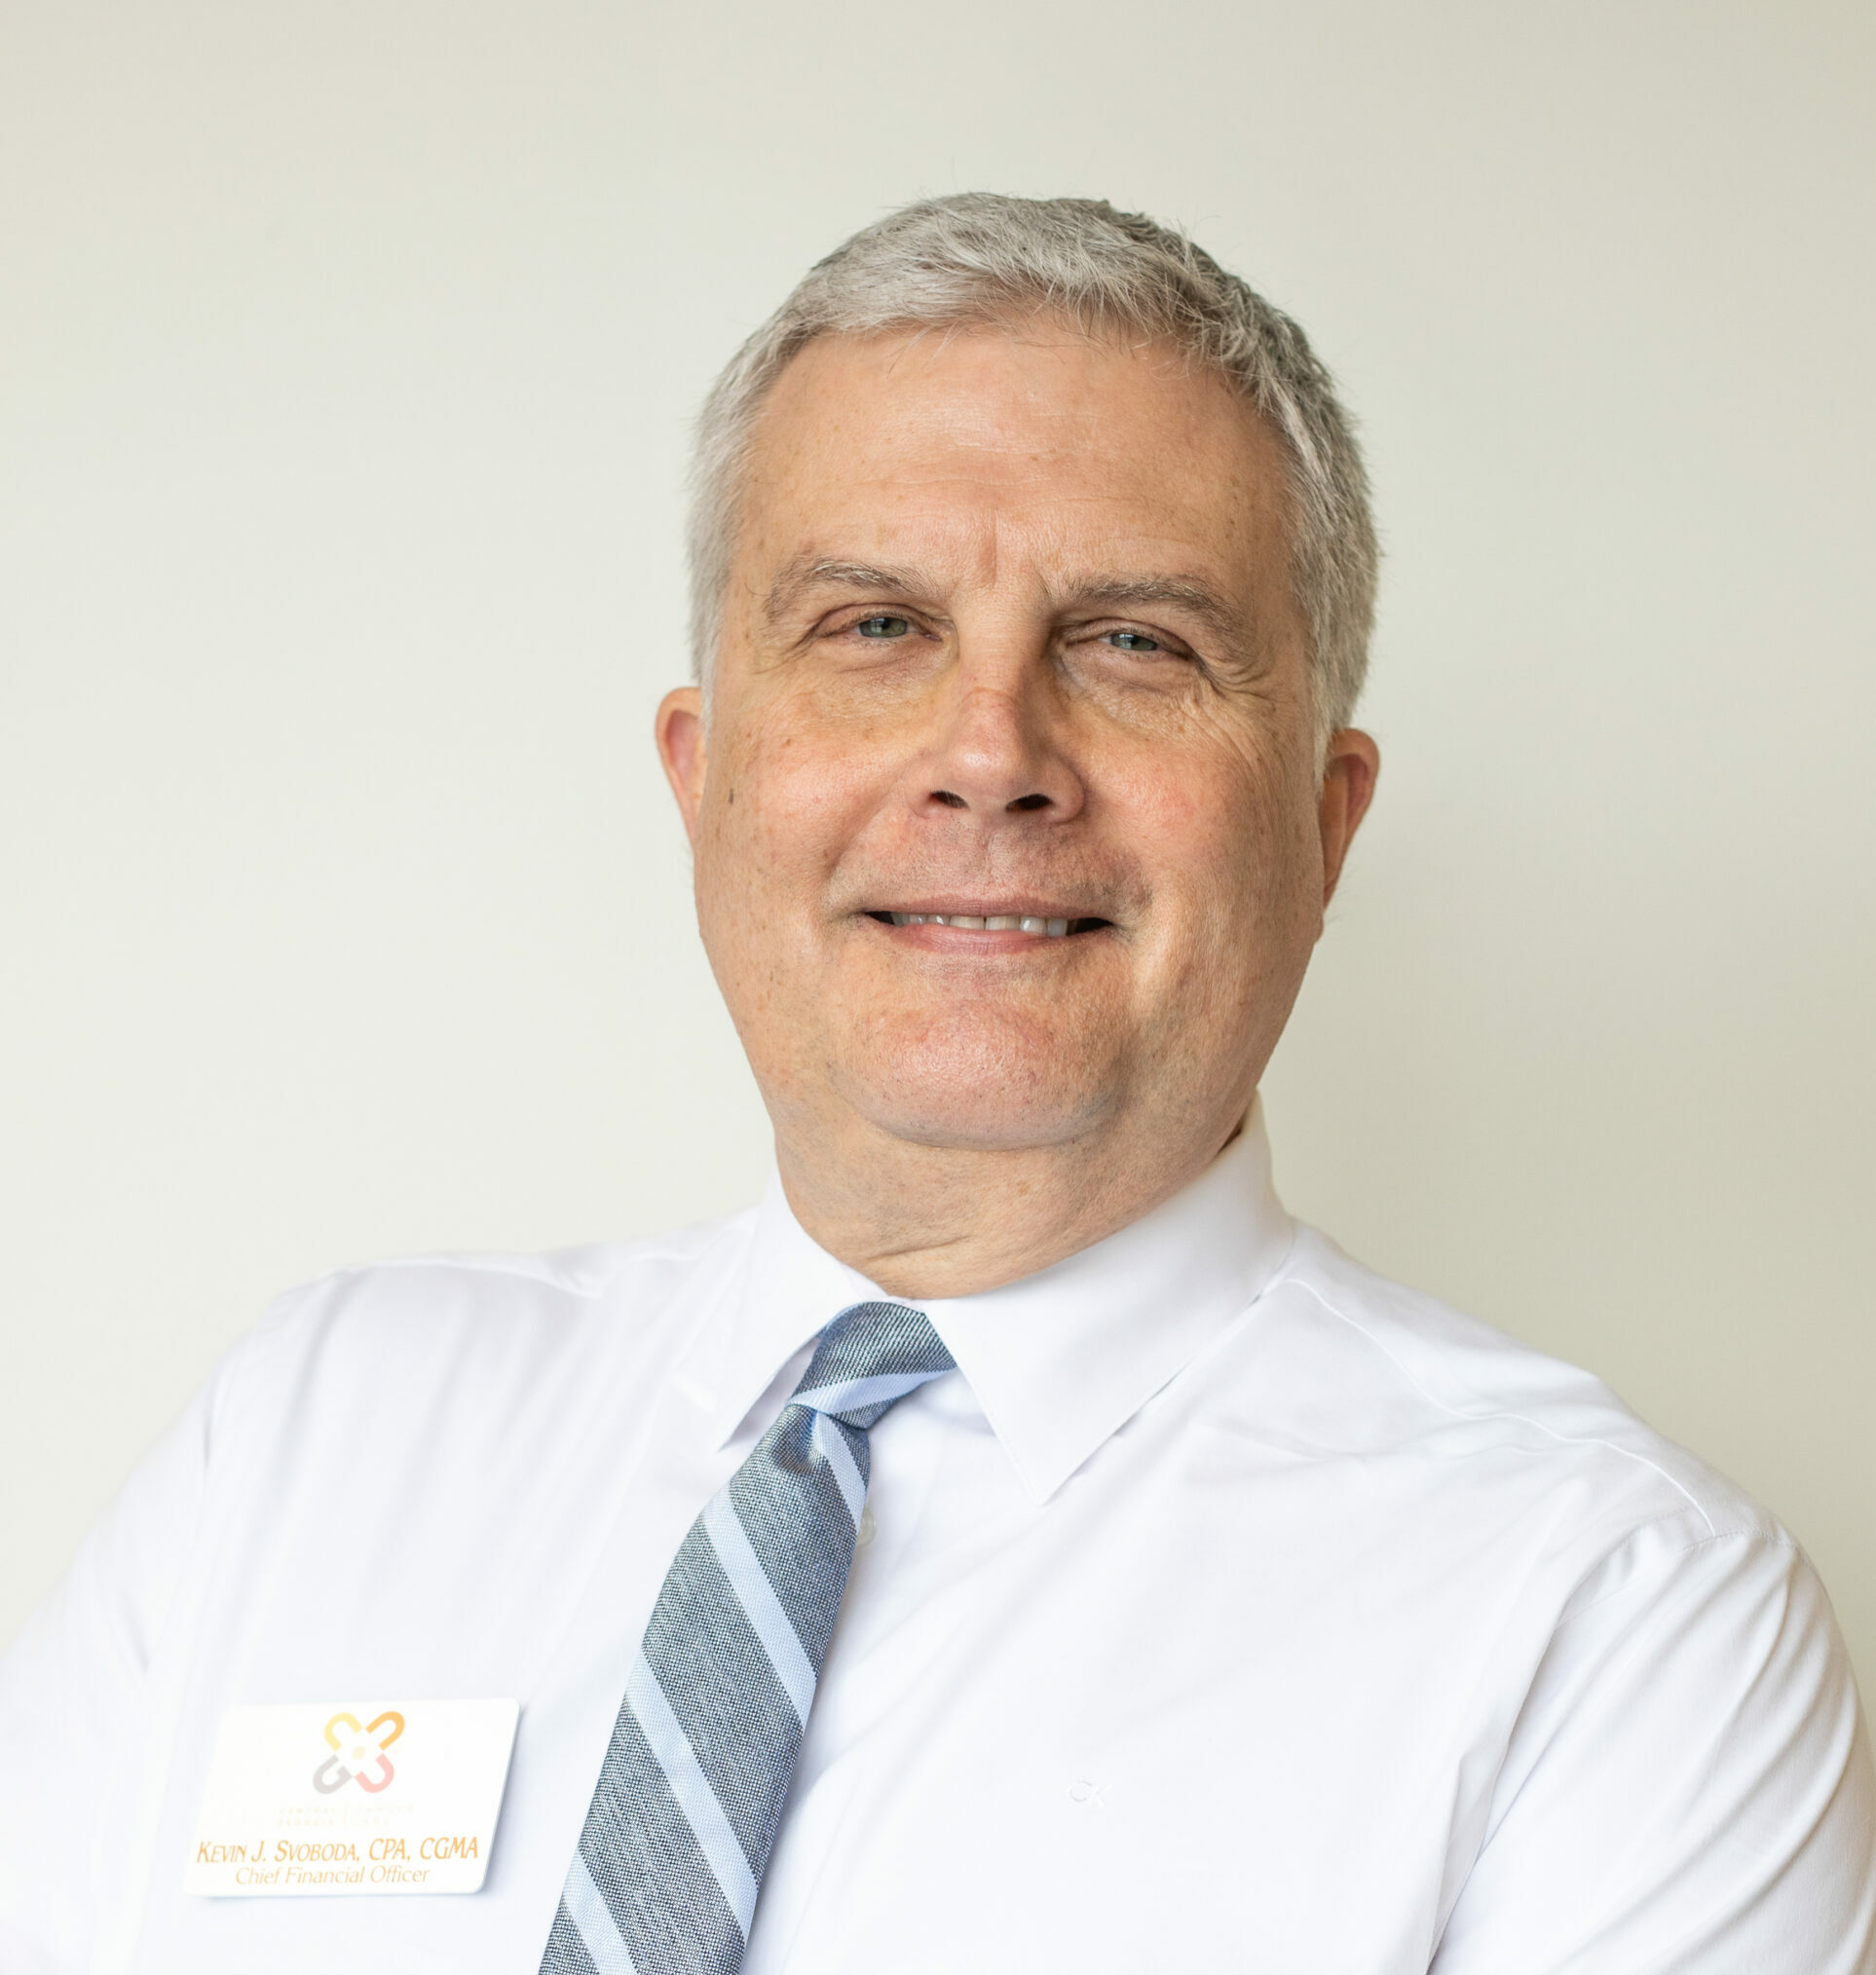 Kevin J. Svoboda